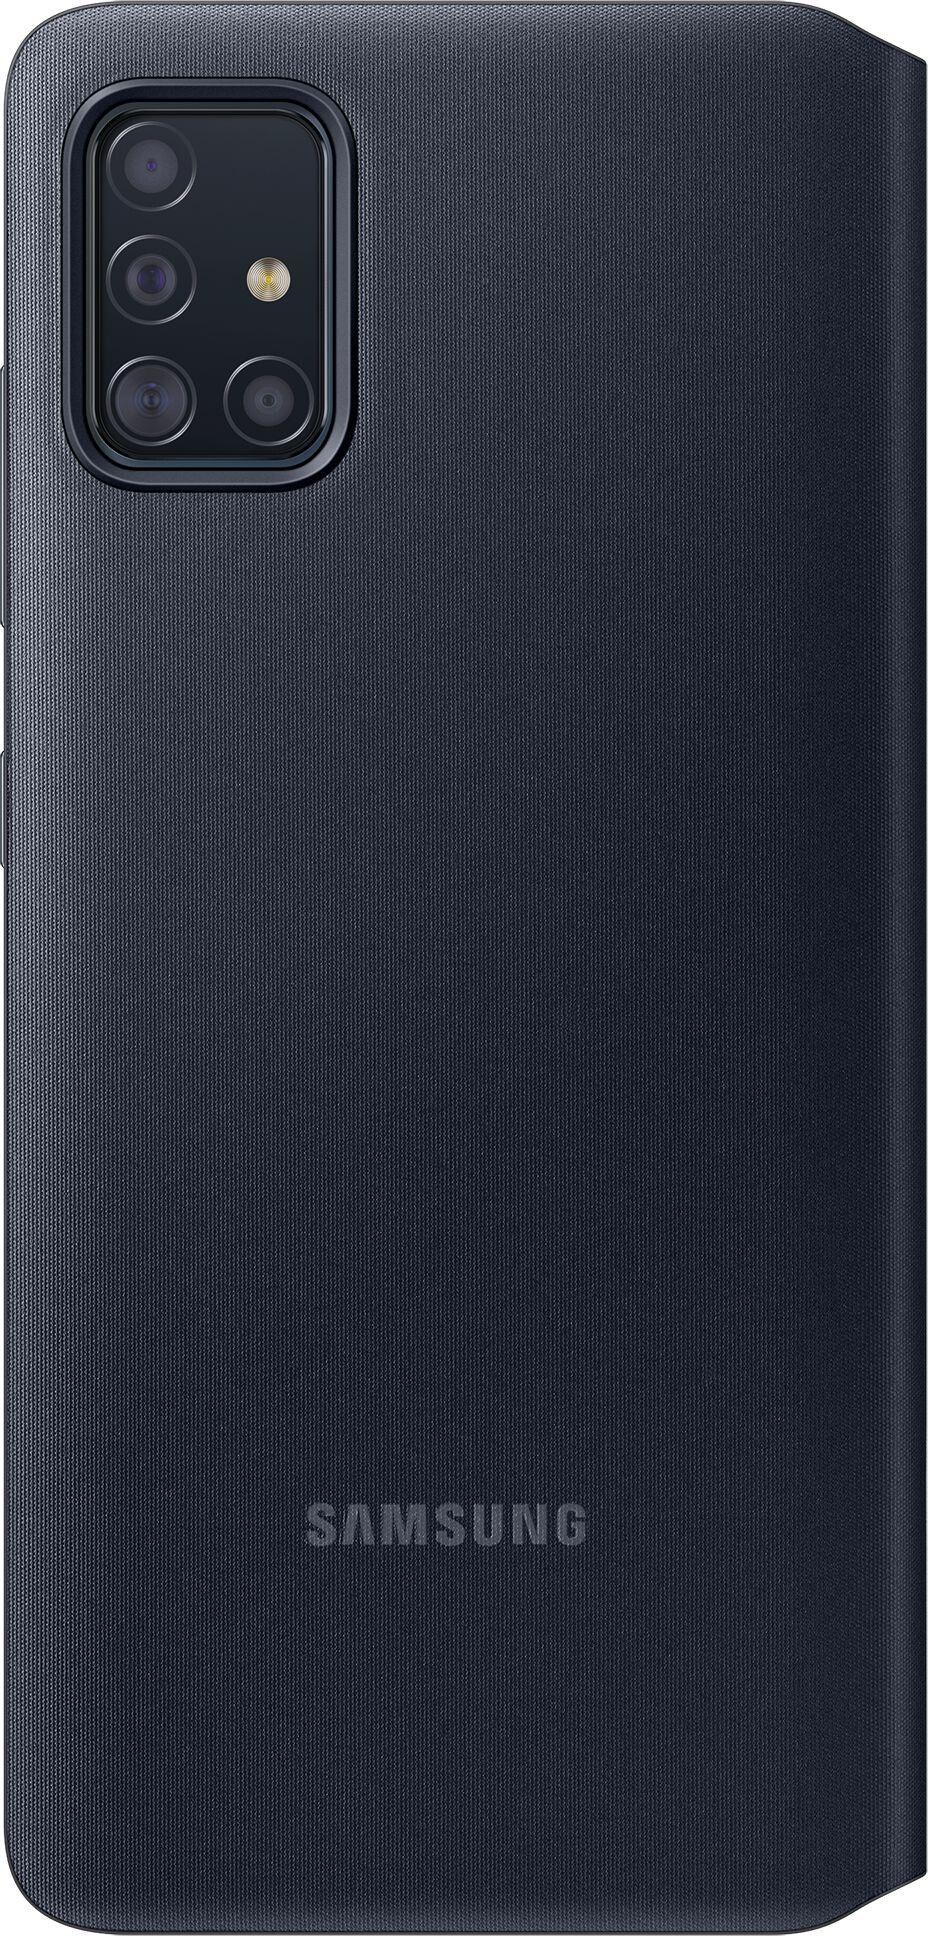 Чехол Samsung S View Wallet Cover для Samsung A515 (EF-EA515PBEGRU) Black от Територія твоєї техніки - 2